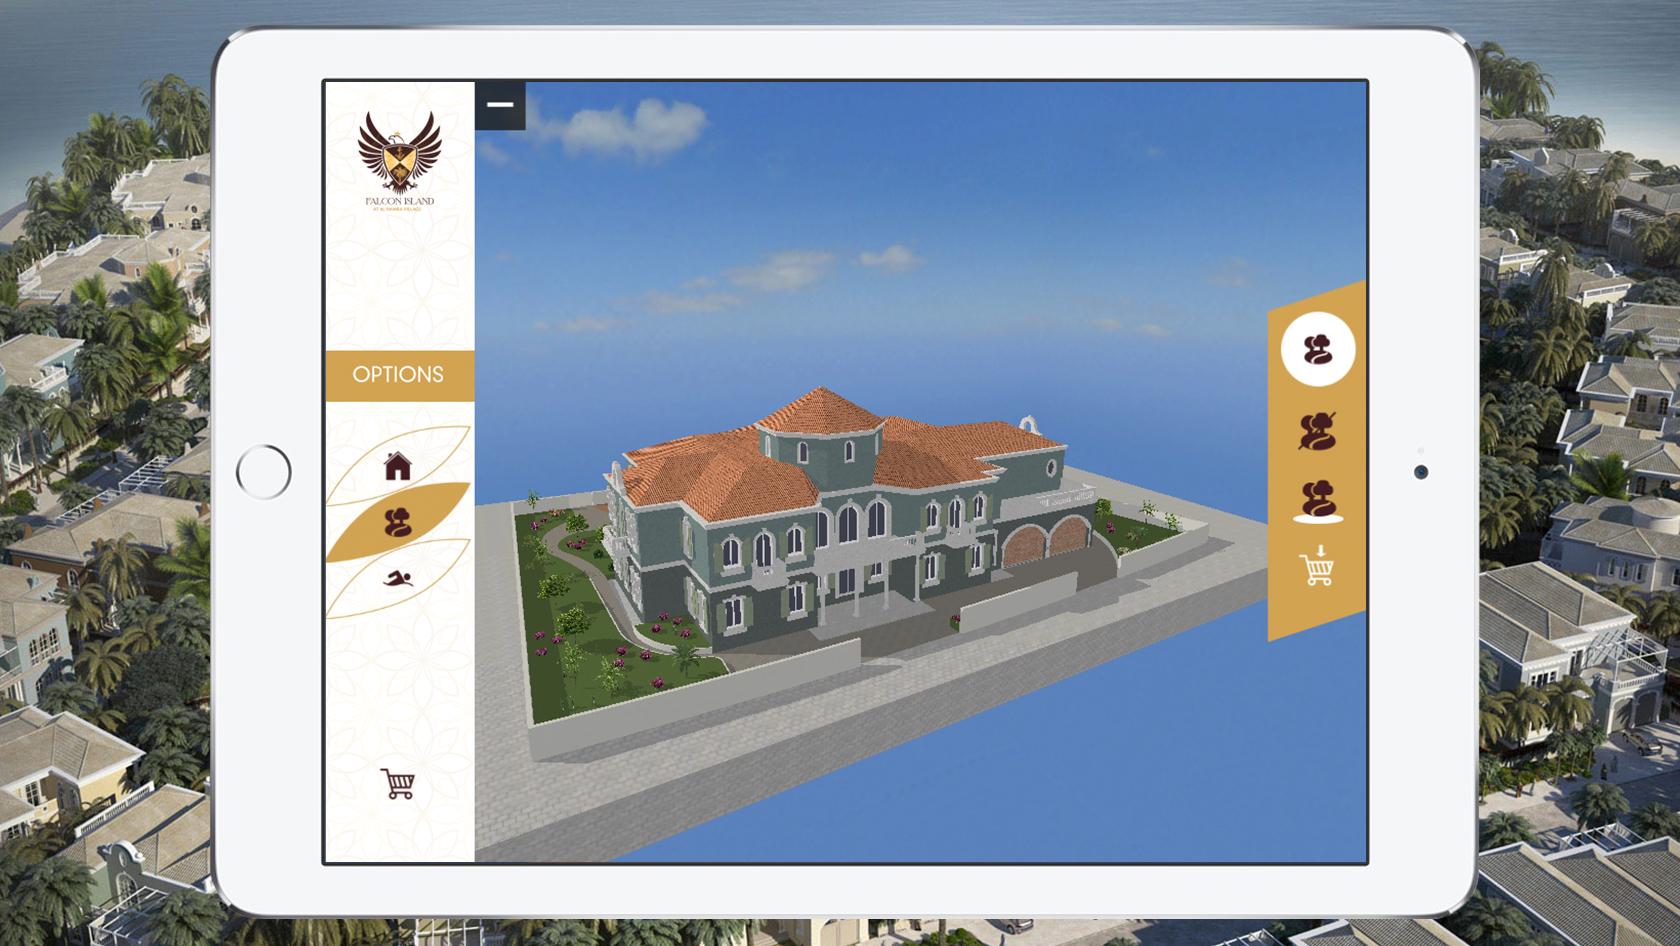 You can now build a multi million dollar home via your ipad